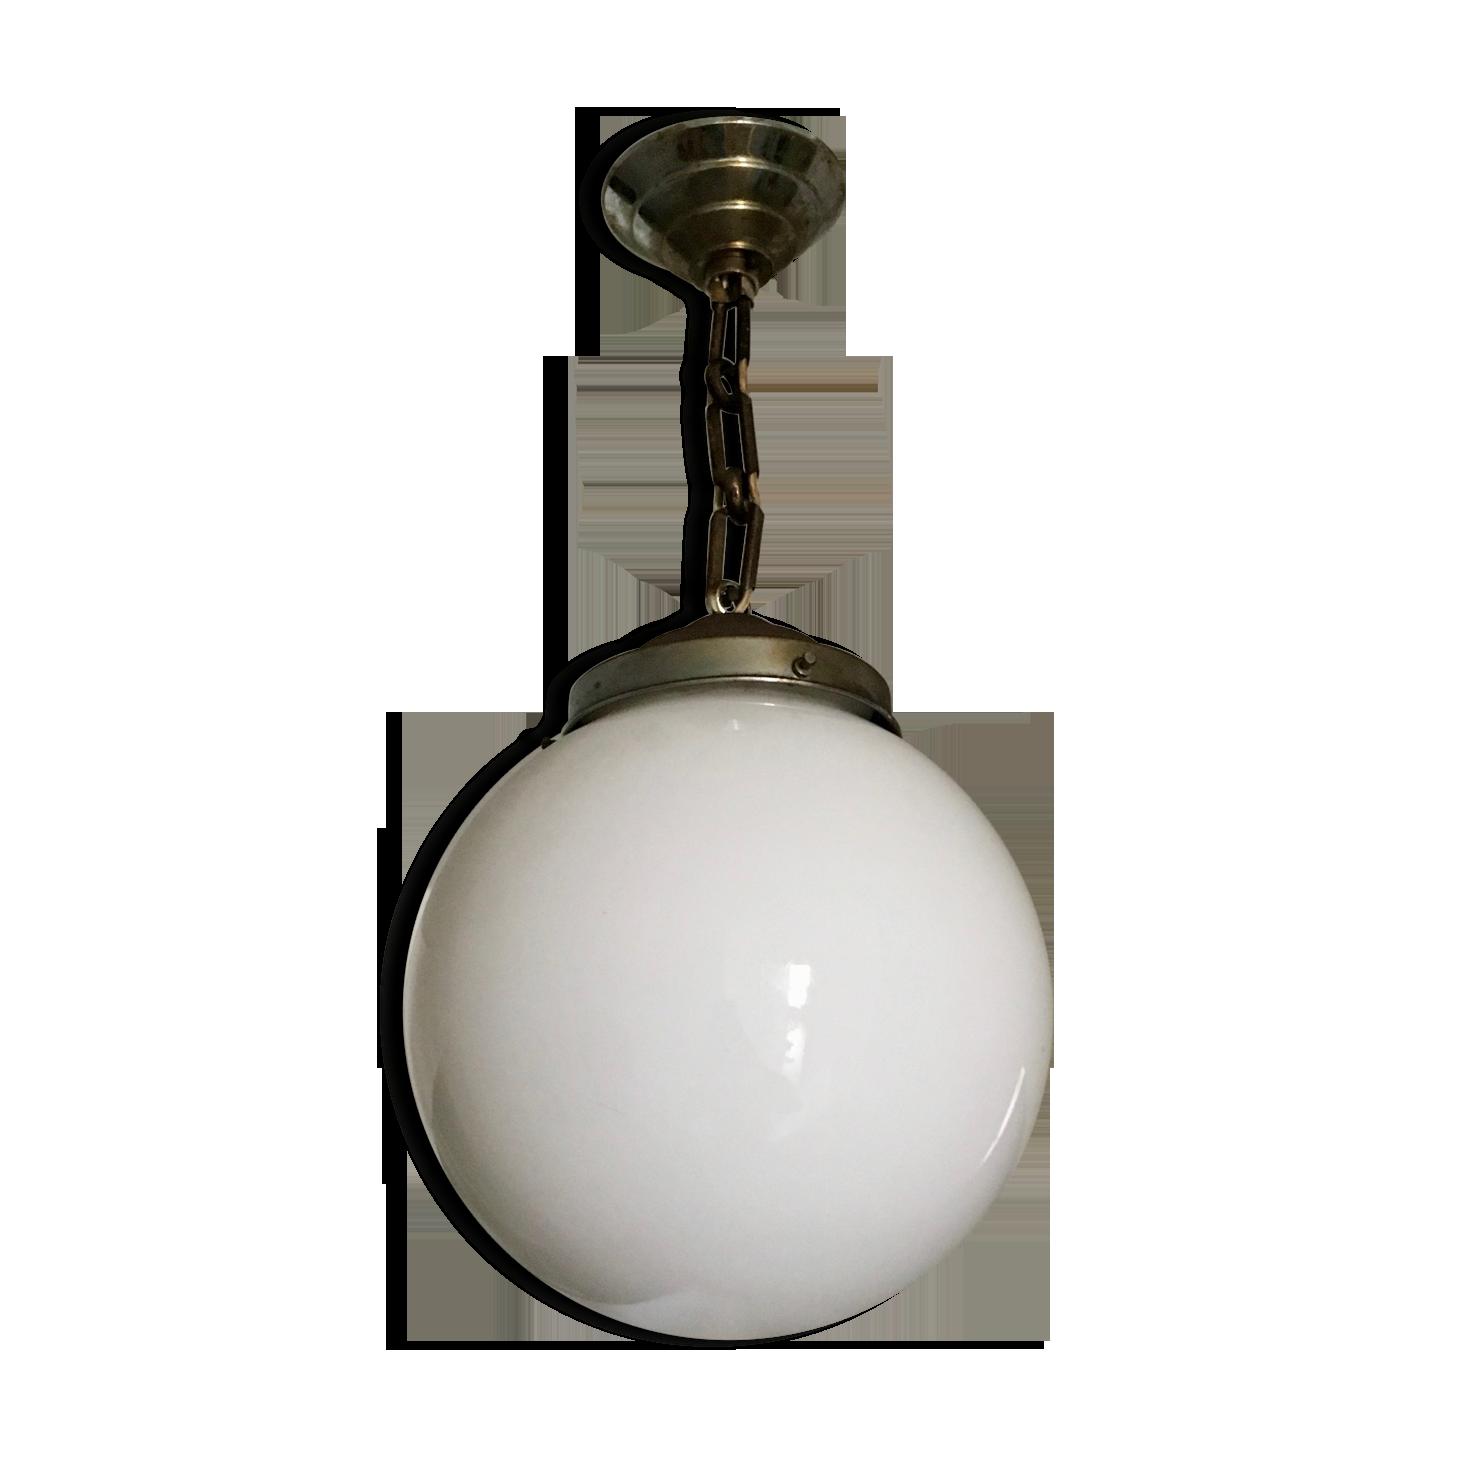 Antiques Antique Globe Opaline White For Suspension Chandelier